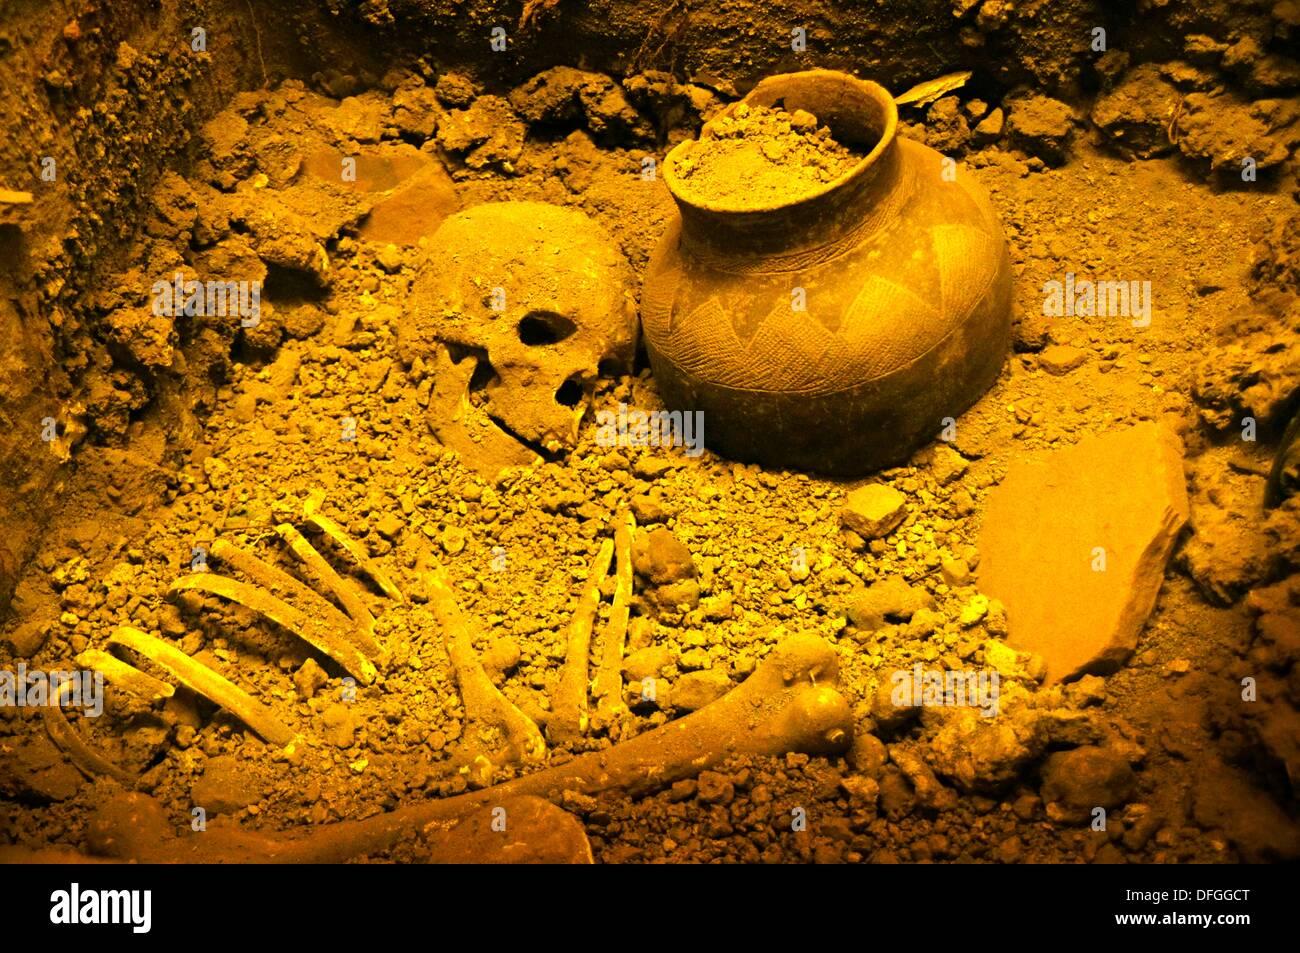 Burial at Toutswemogala 650-1300 AD of a 30 year old woman, Gaborone National Museum, Botswana - Stock Image